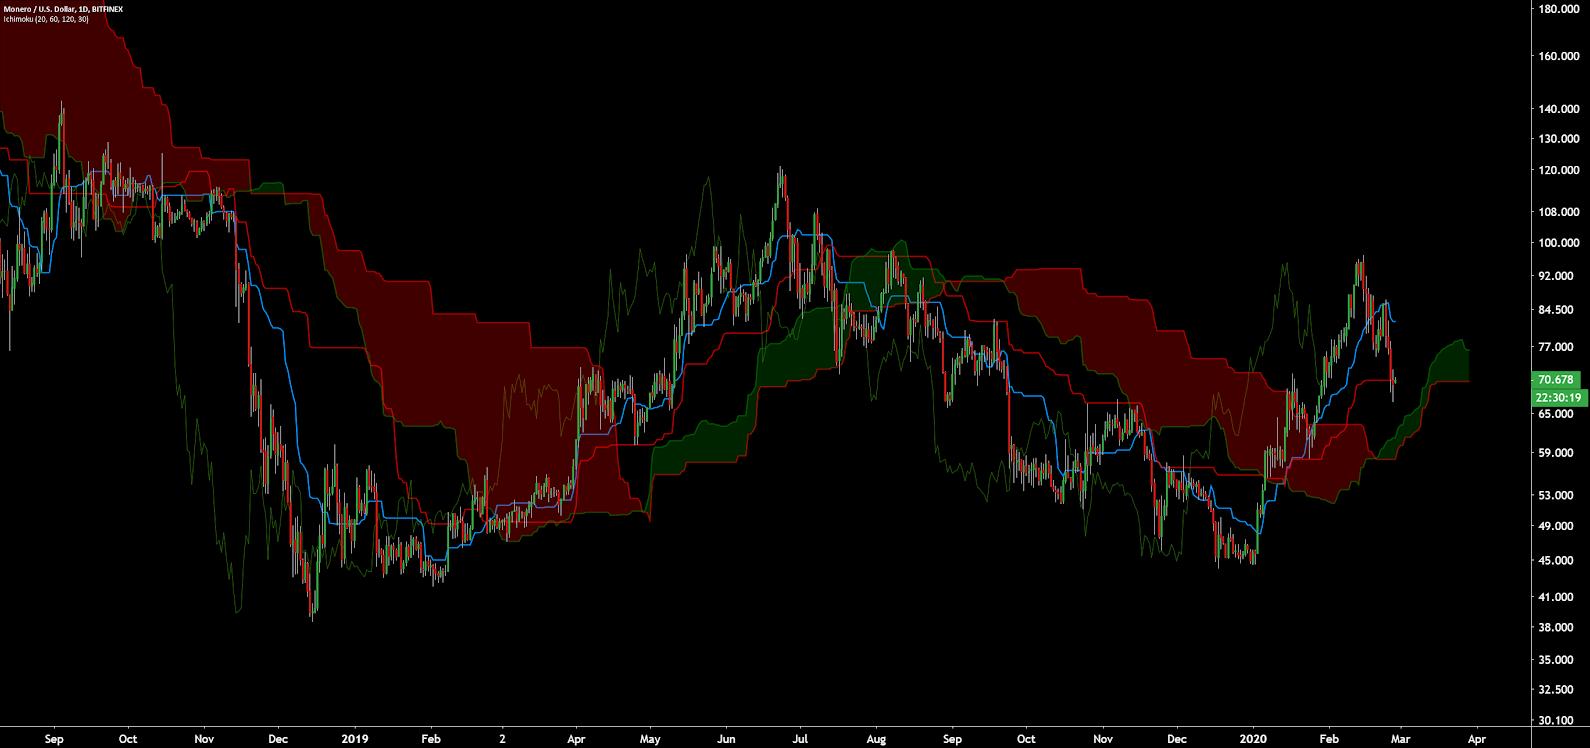 Monero Price Analysis 28 Feb 2020 (13)